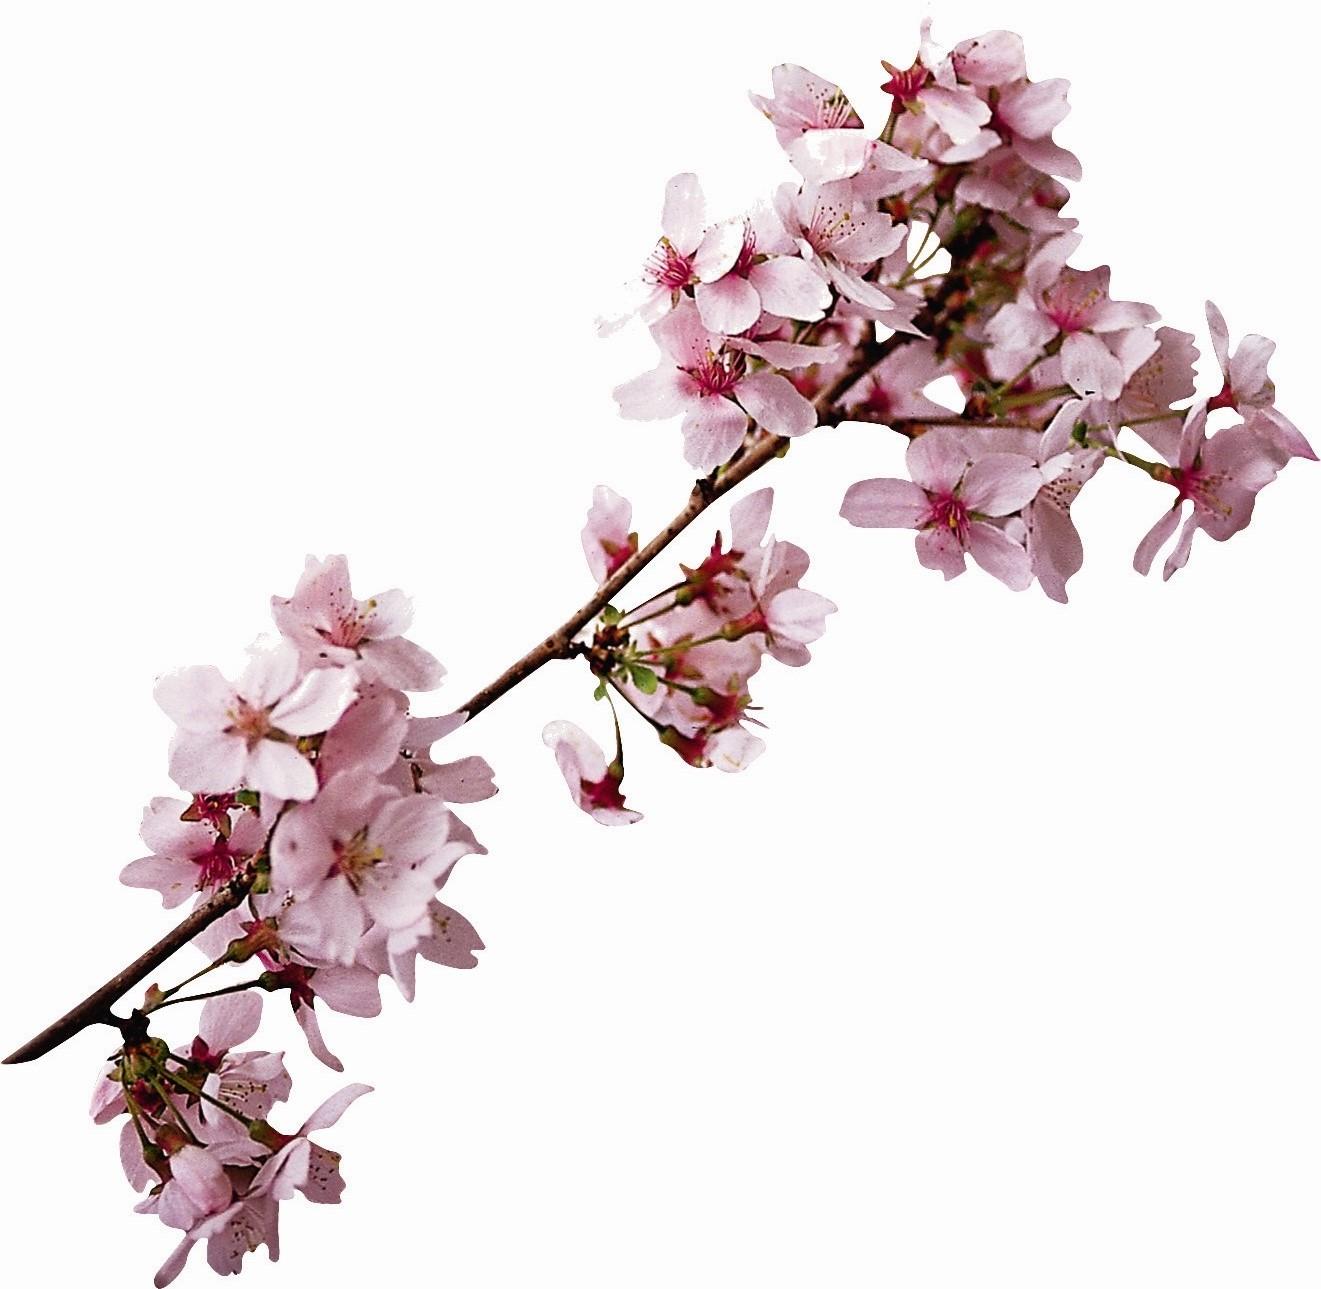 Kirschblütenzweig 195KB